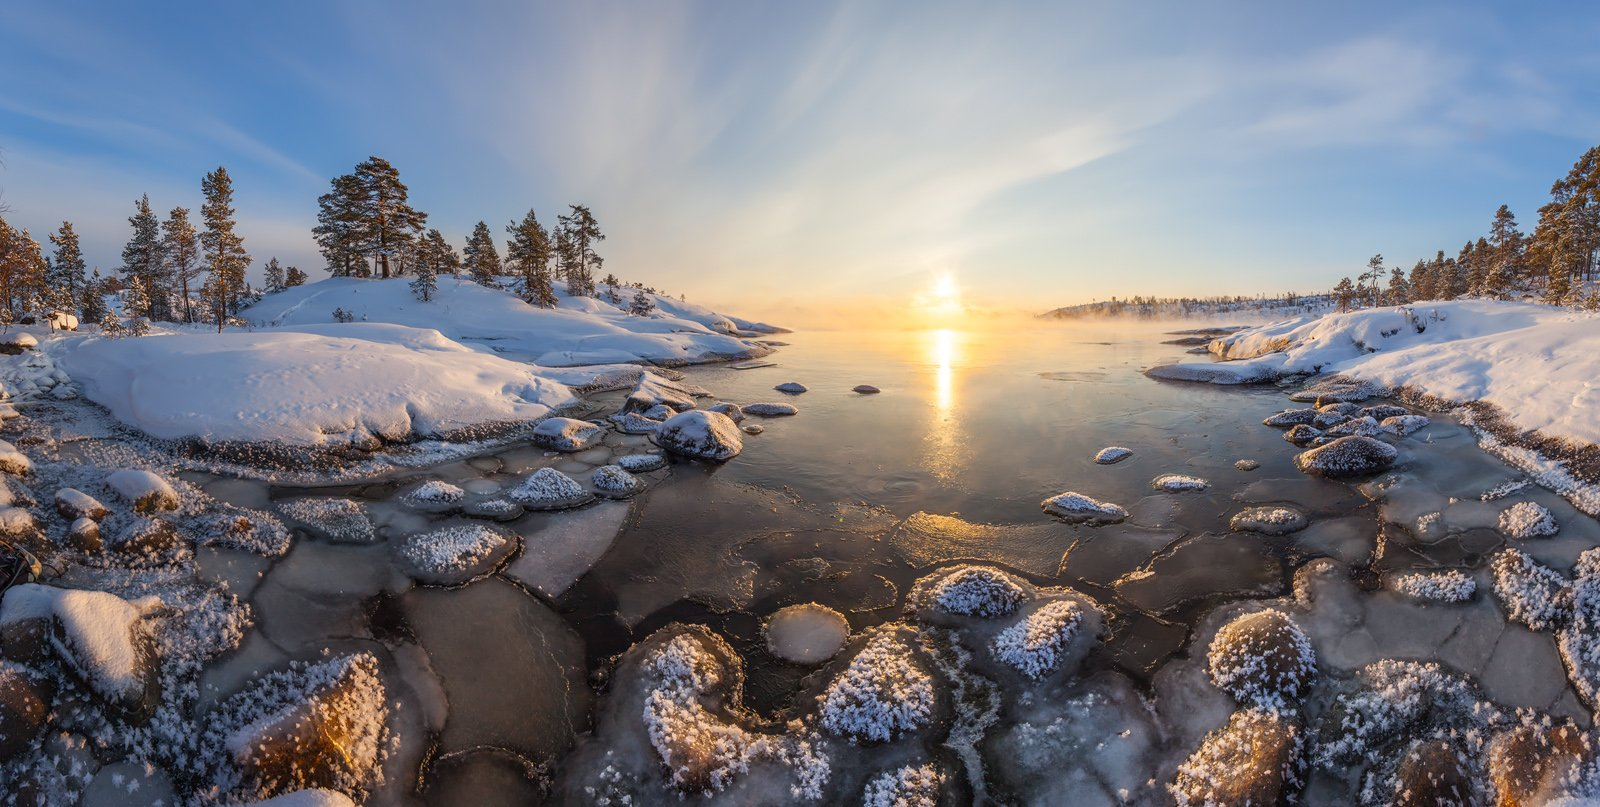 ладога, ладожское озеро, ладожские шхеры, карелия, фототур, Арсений Кашкаров